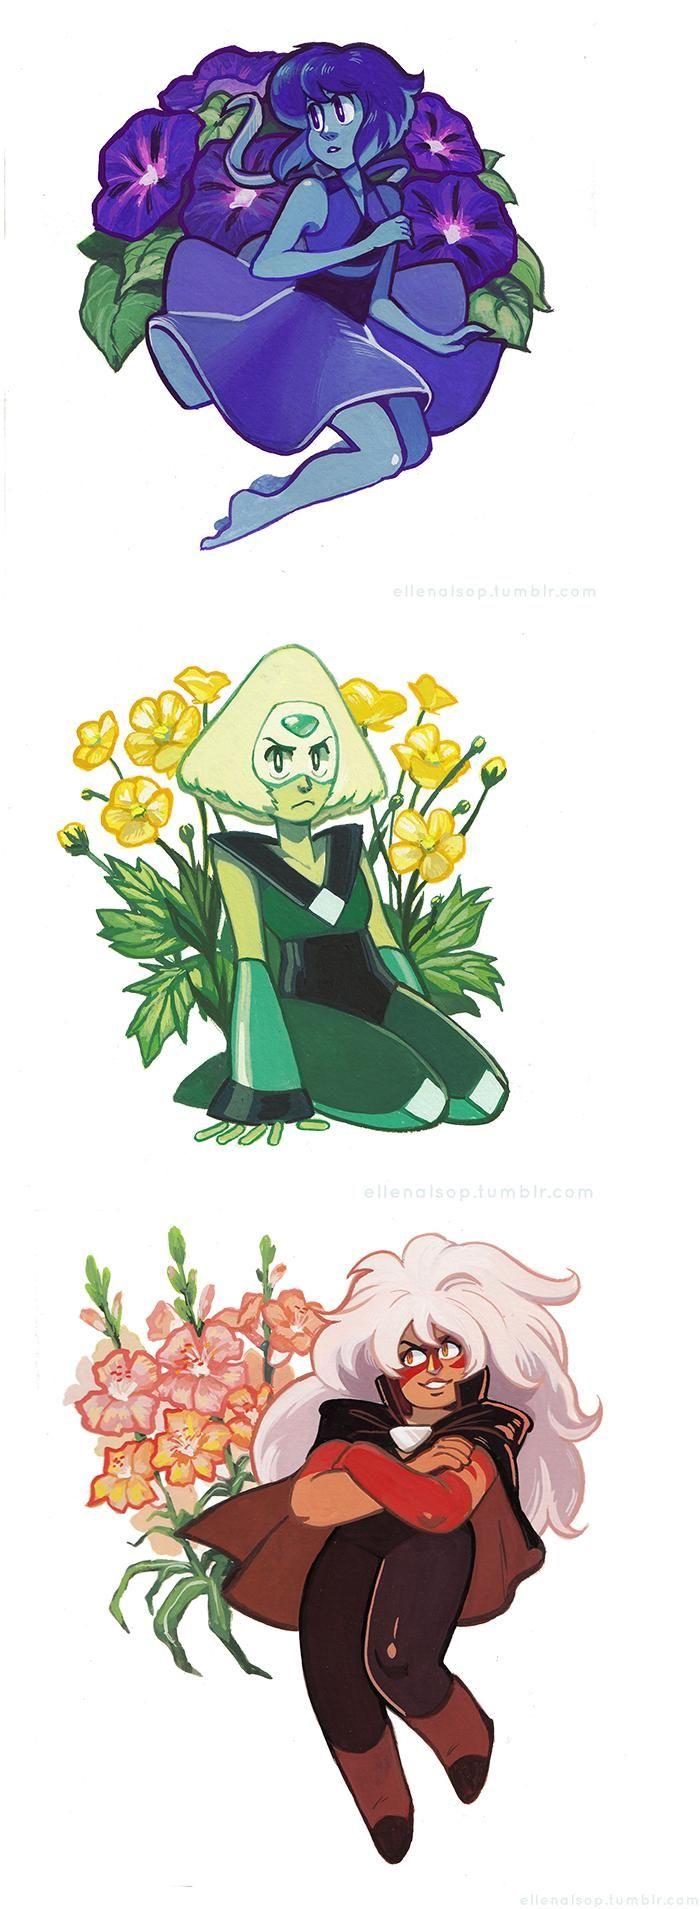 In Bloom - Homeworld Gems